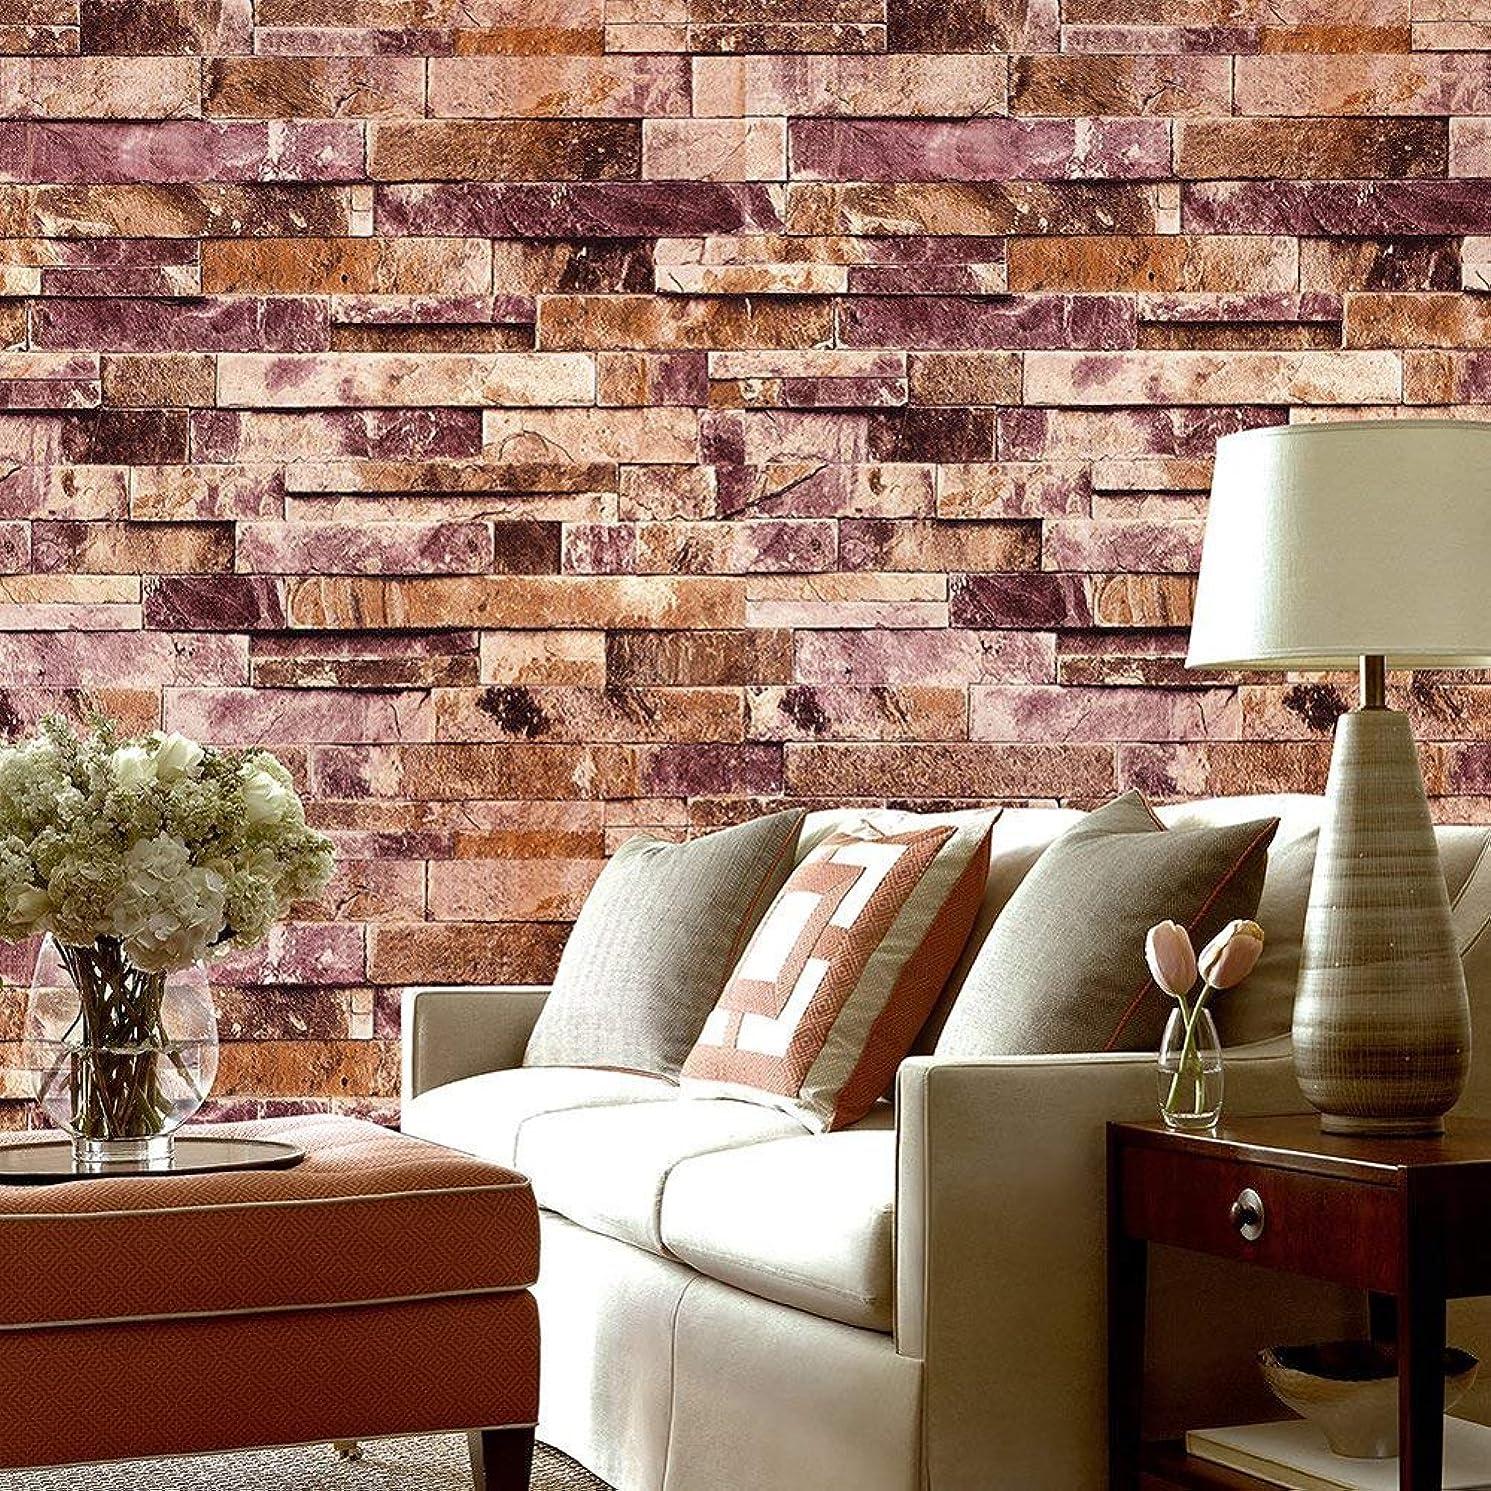 QIHANG Three-Dimensional Wallpaper Brick Wall Wallpaper 3D Textured Bricks Red Color